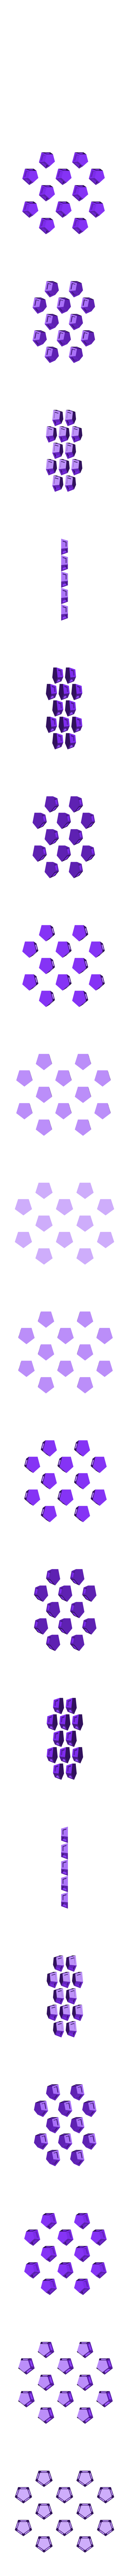 truncated_icosahedron_12_pentagons.stl Download free STL file Soccer ball (Truncated icosahedron) assembly • 3D printer object, mattias_selin